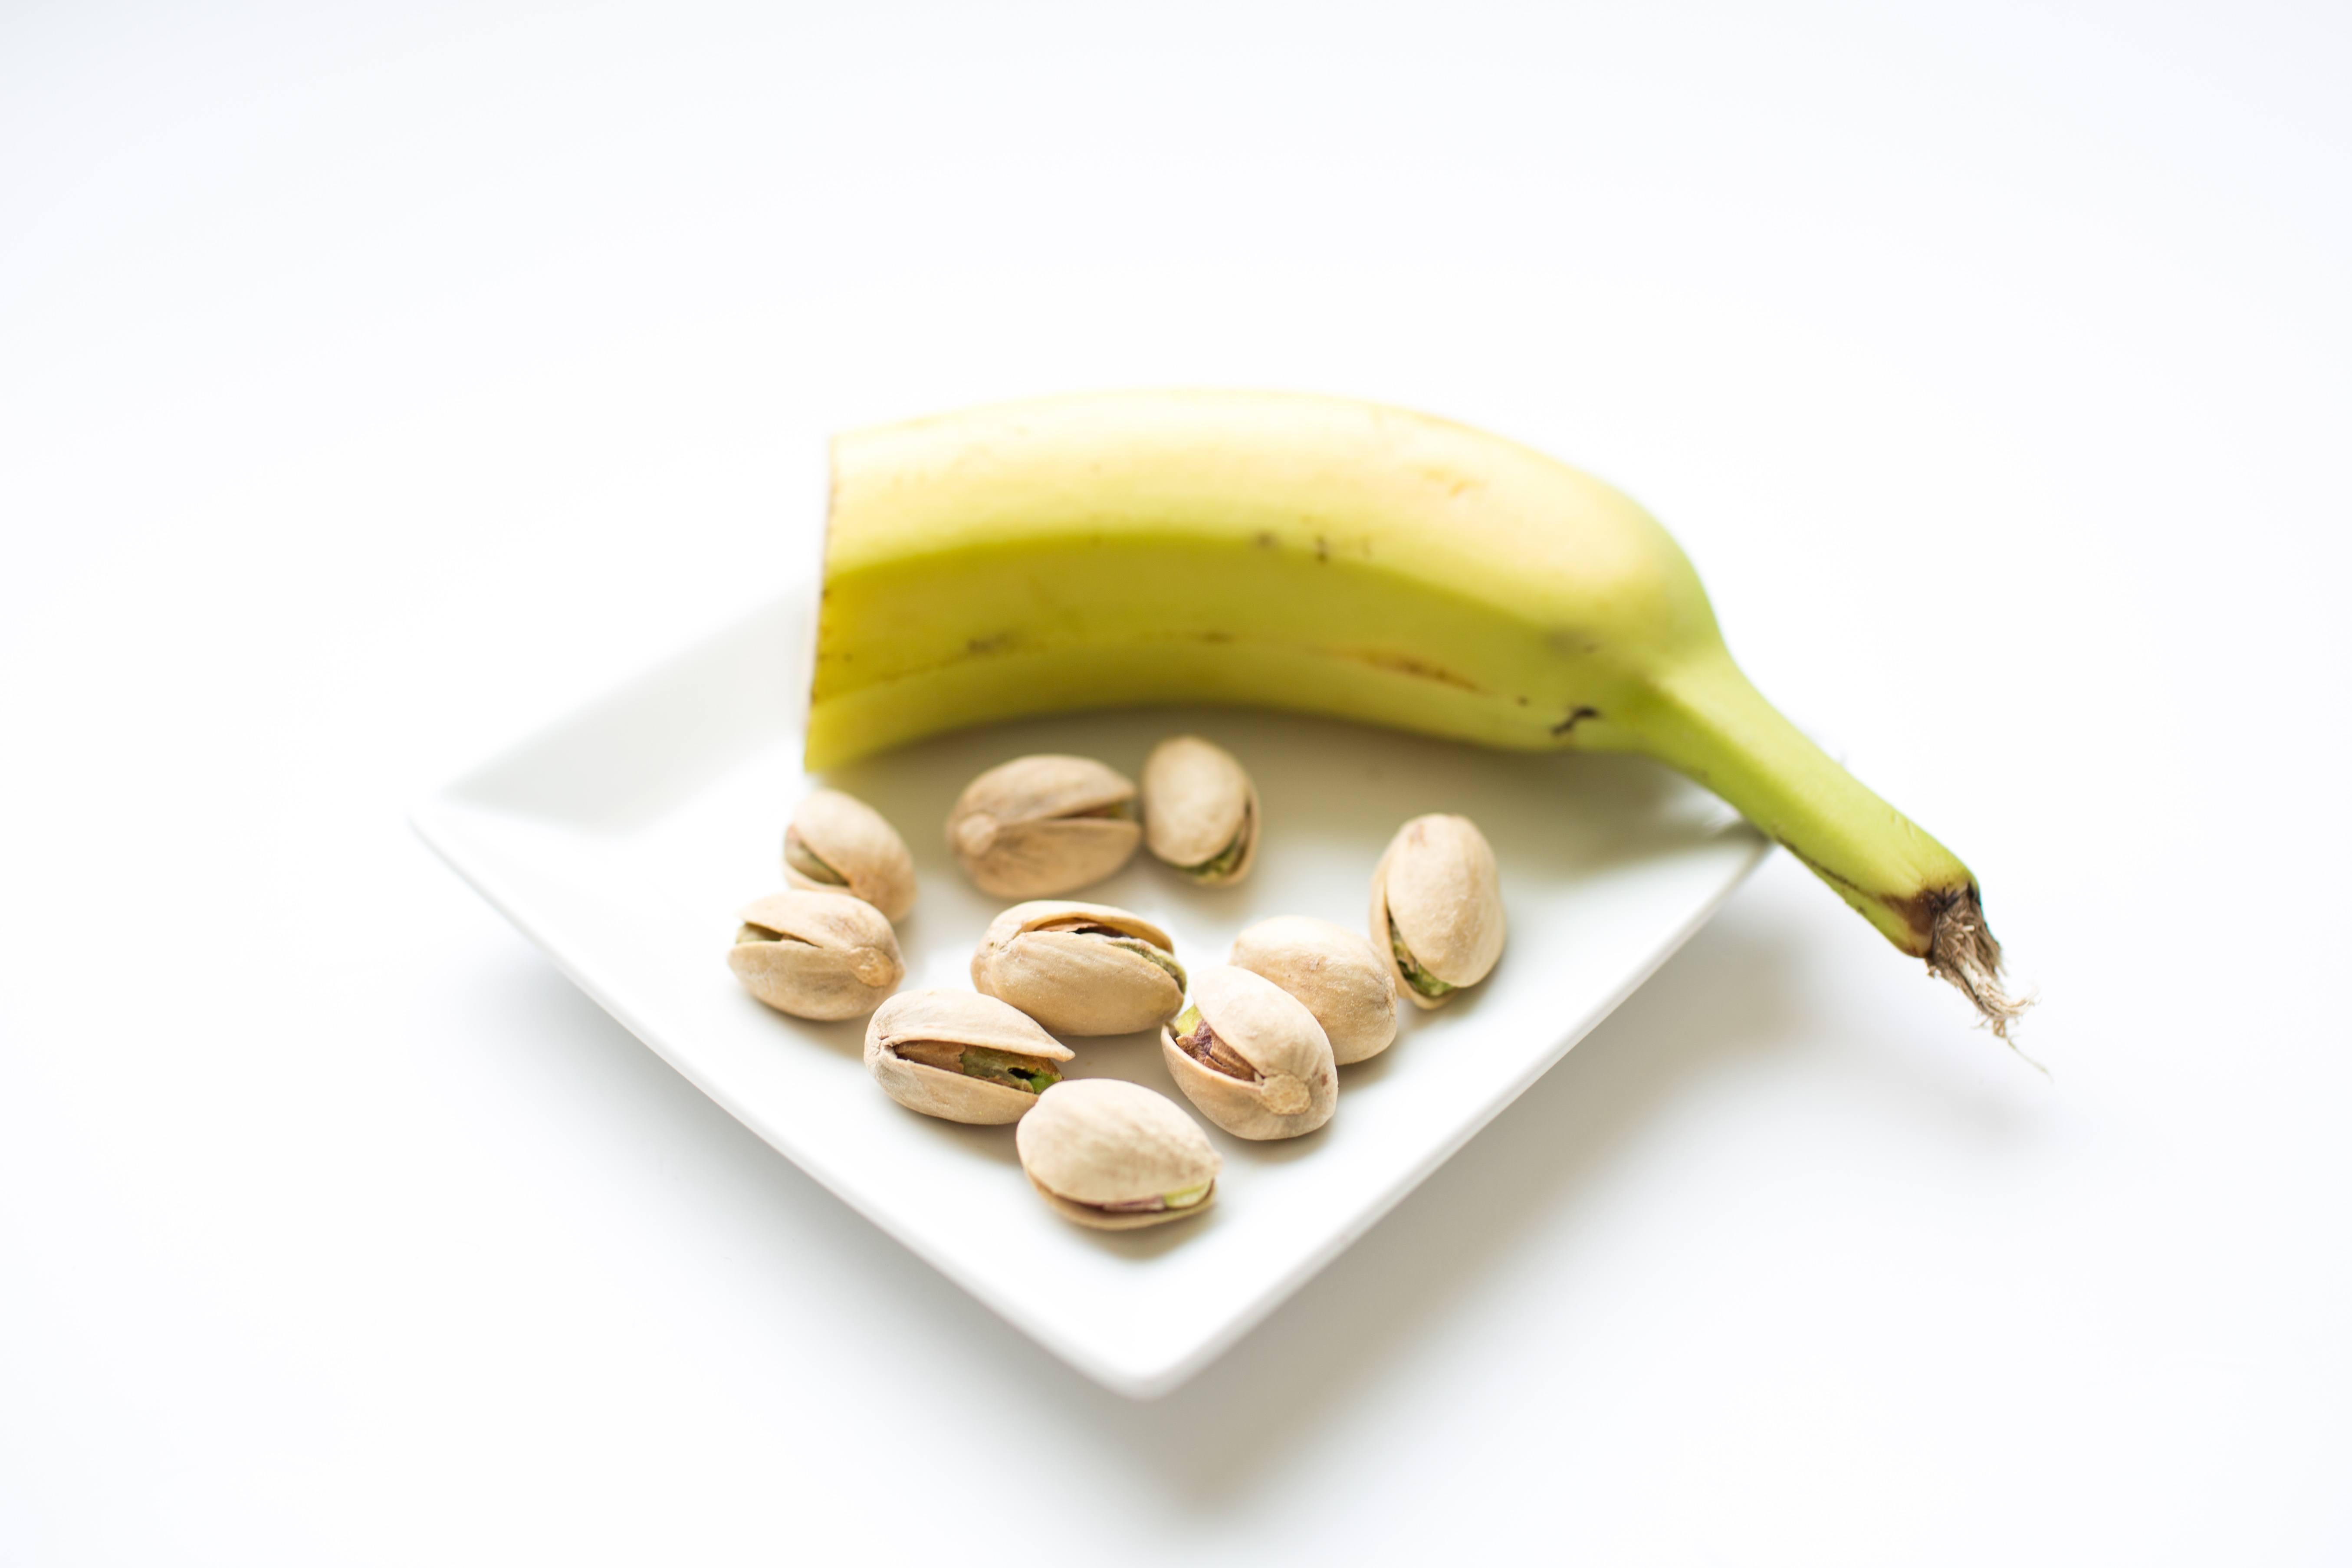 100 calorie snack banana and pistachios